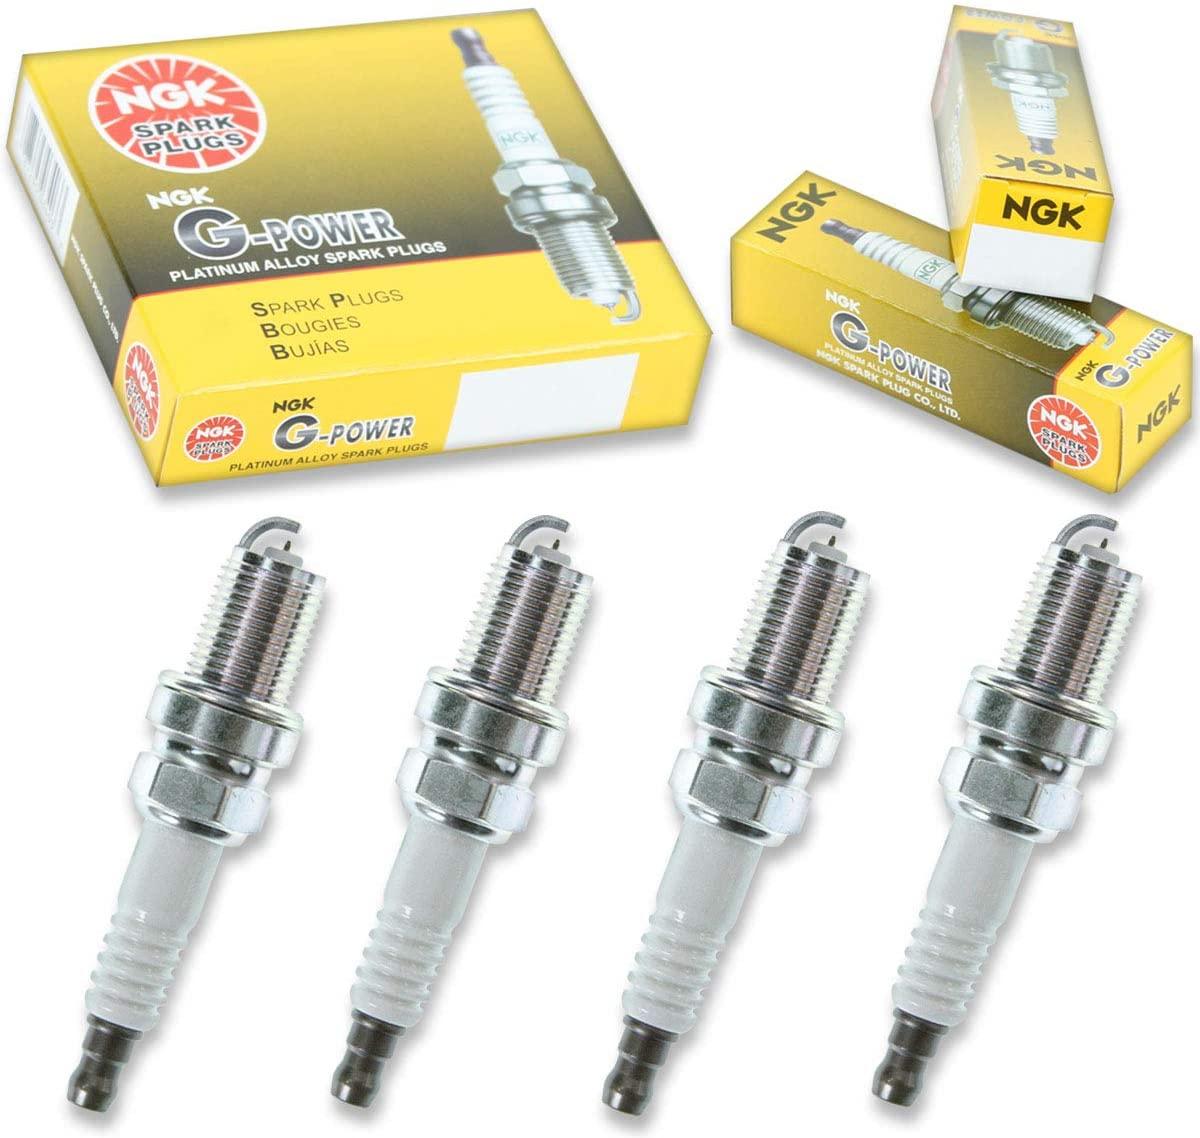 4 pcs NGK G-Power Spark Plugs for 1999-2003 Saab 9-3 2.3L 2.0L L4 2.0L - Engine Kit Set Tune Up